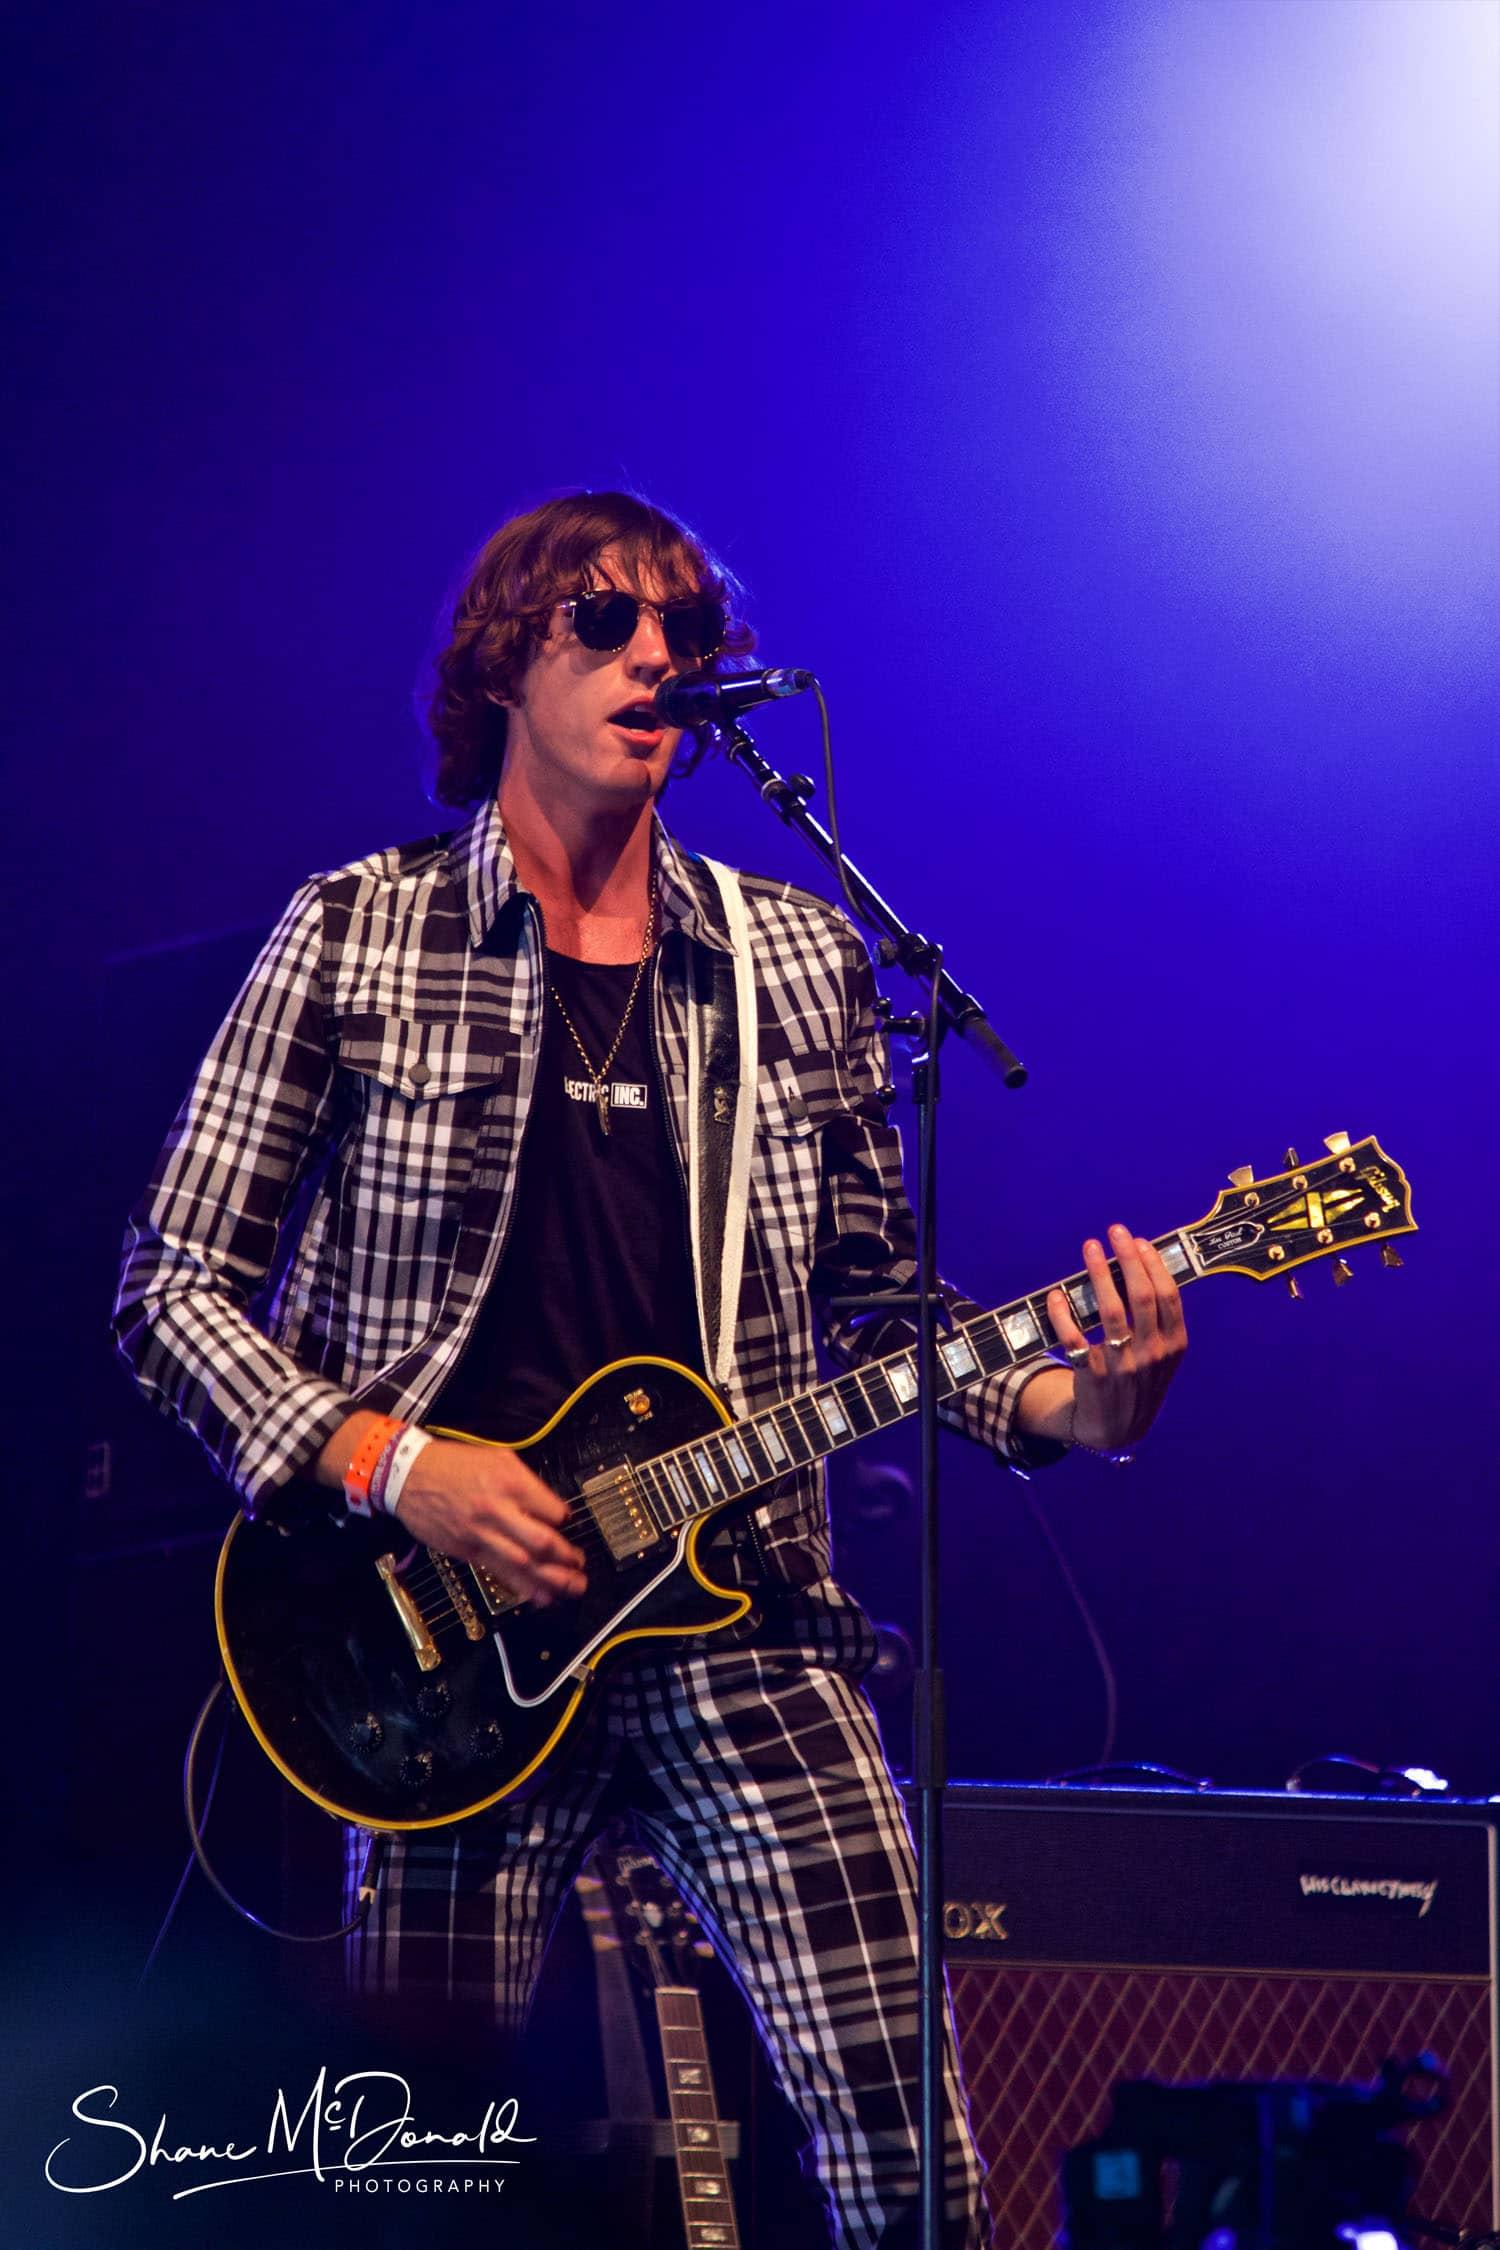 Judas at the Isle of Wight Festival - closeup